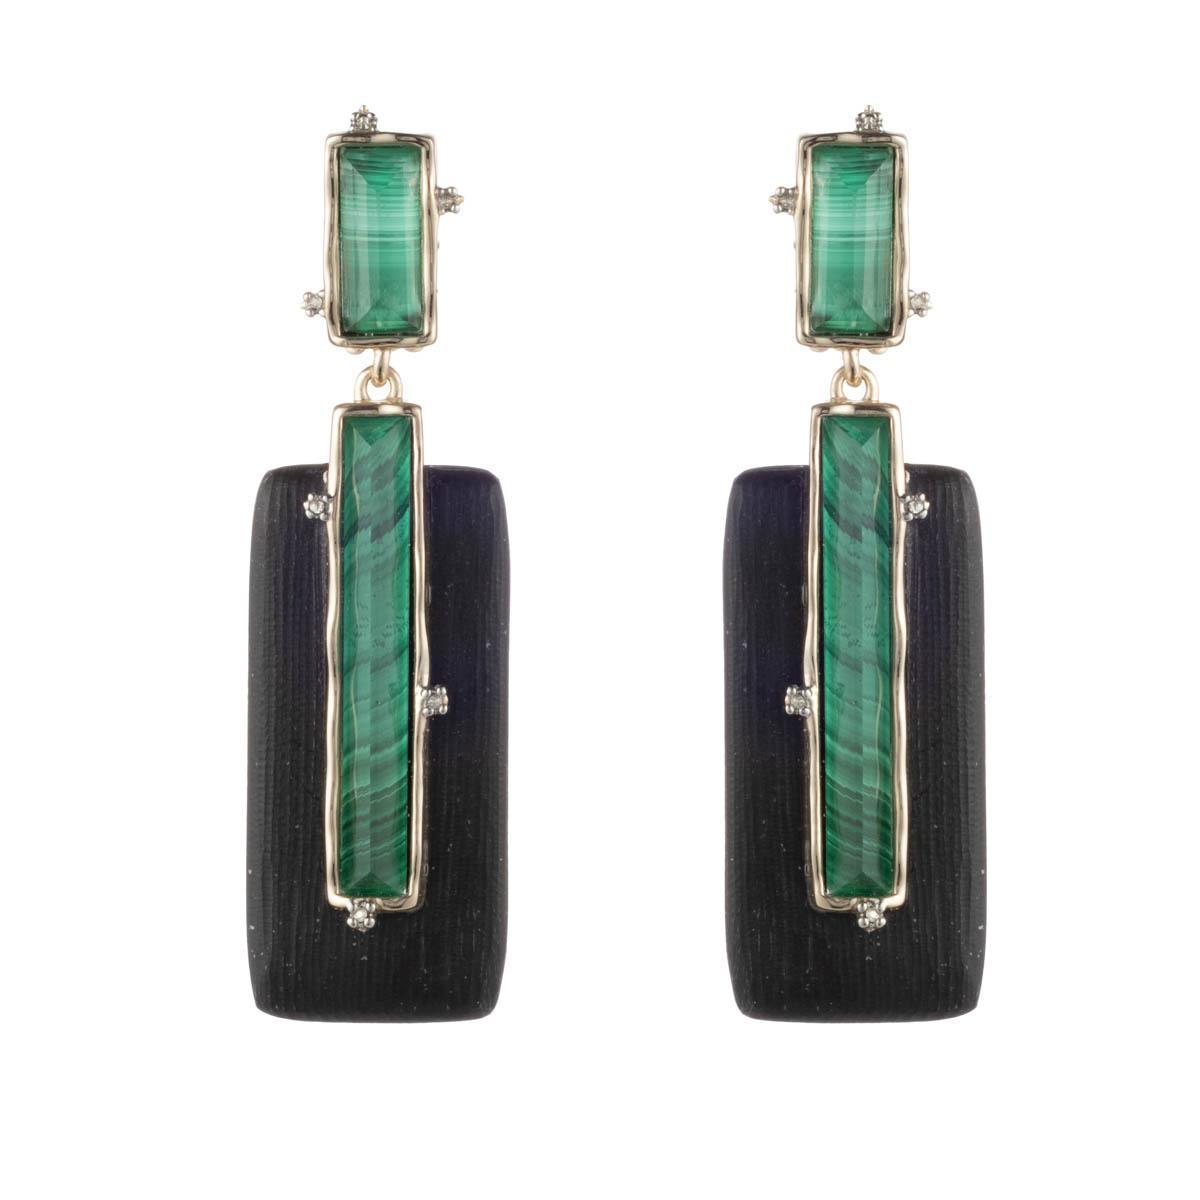 decb4fe8c Alexis Bittar Stone Studded Retro Clip Earring in Black - Lyst